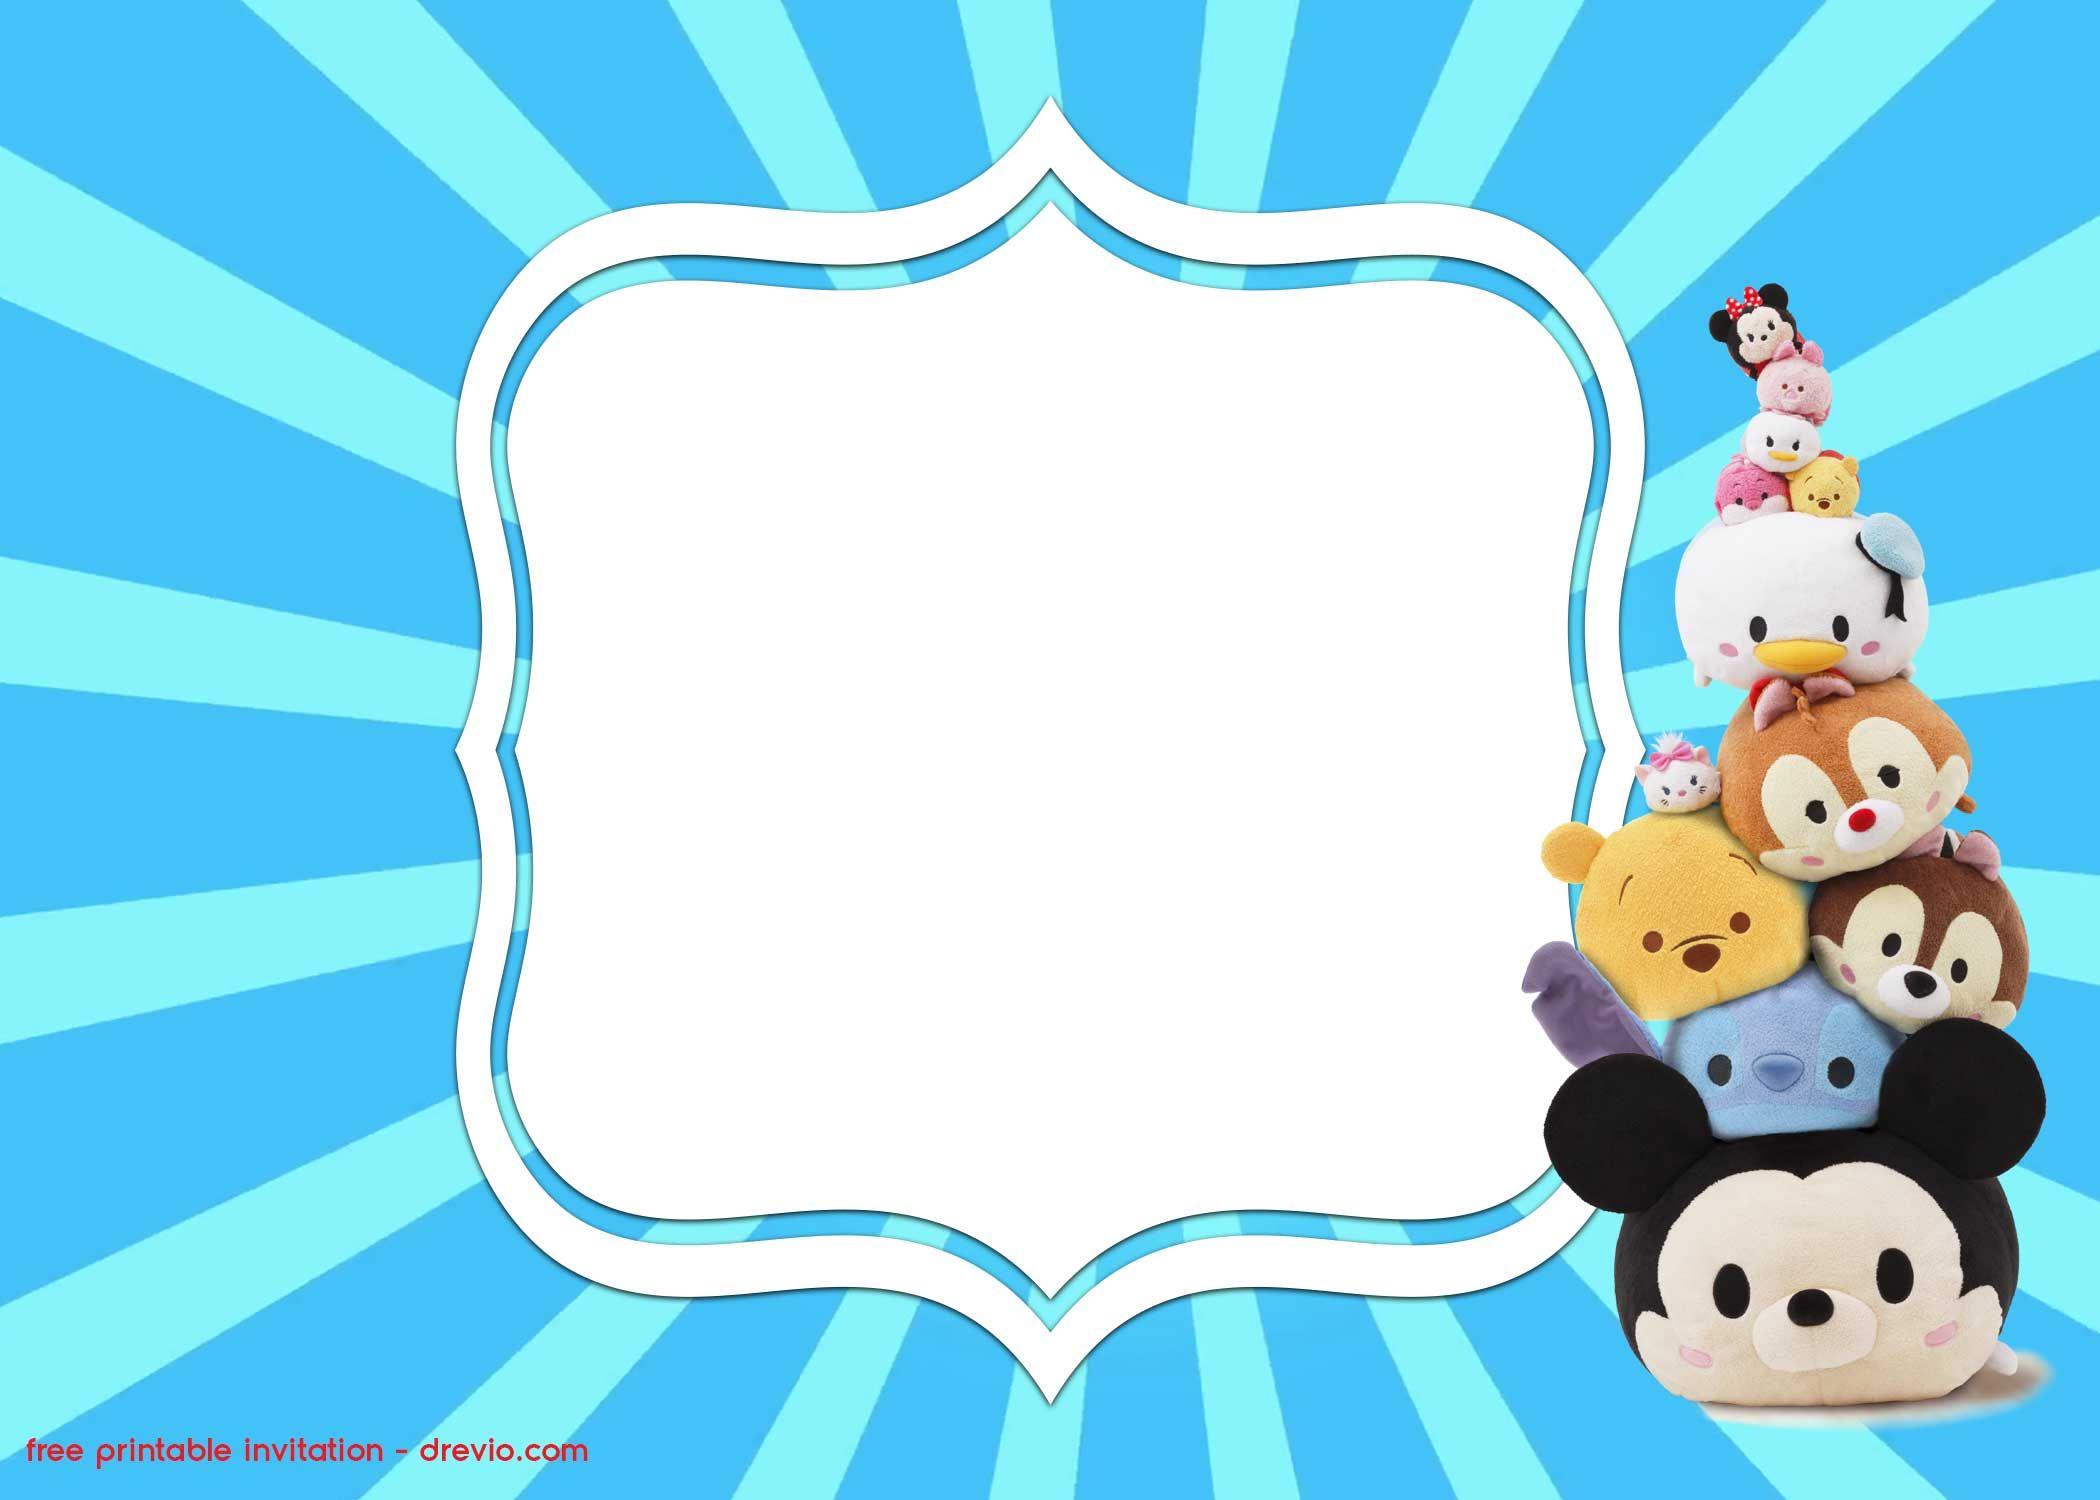 FREE Printable Disney Tsum Tsum Invitation Templates – Mickey and